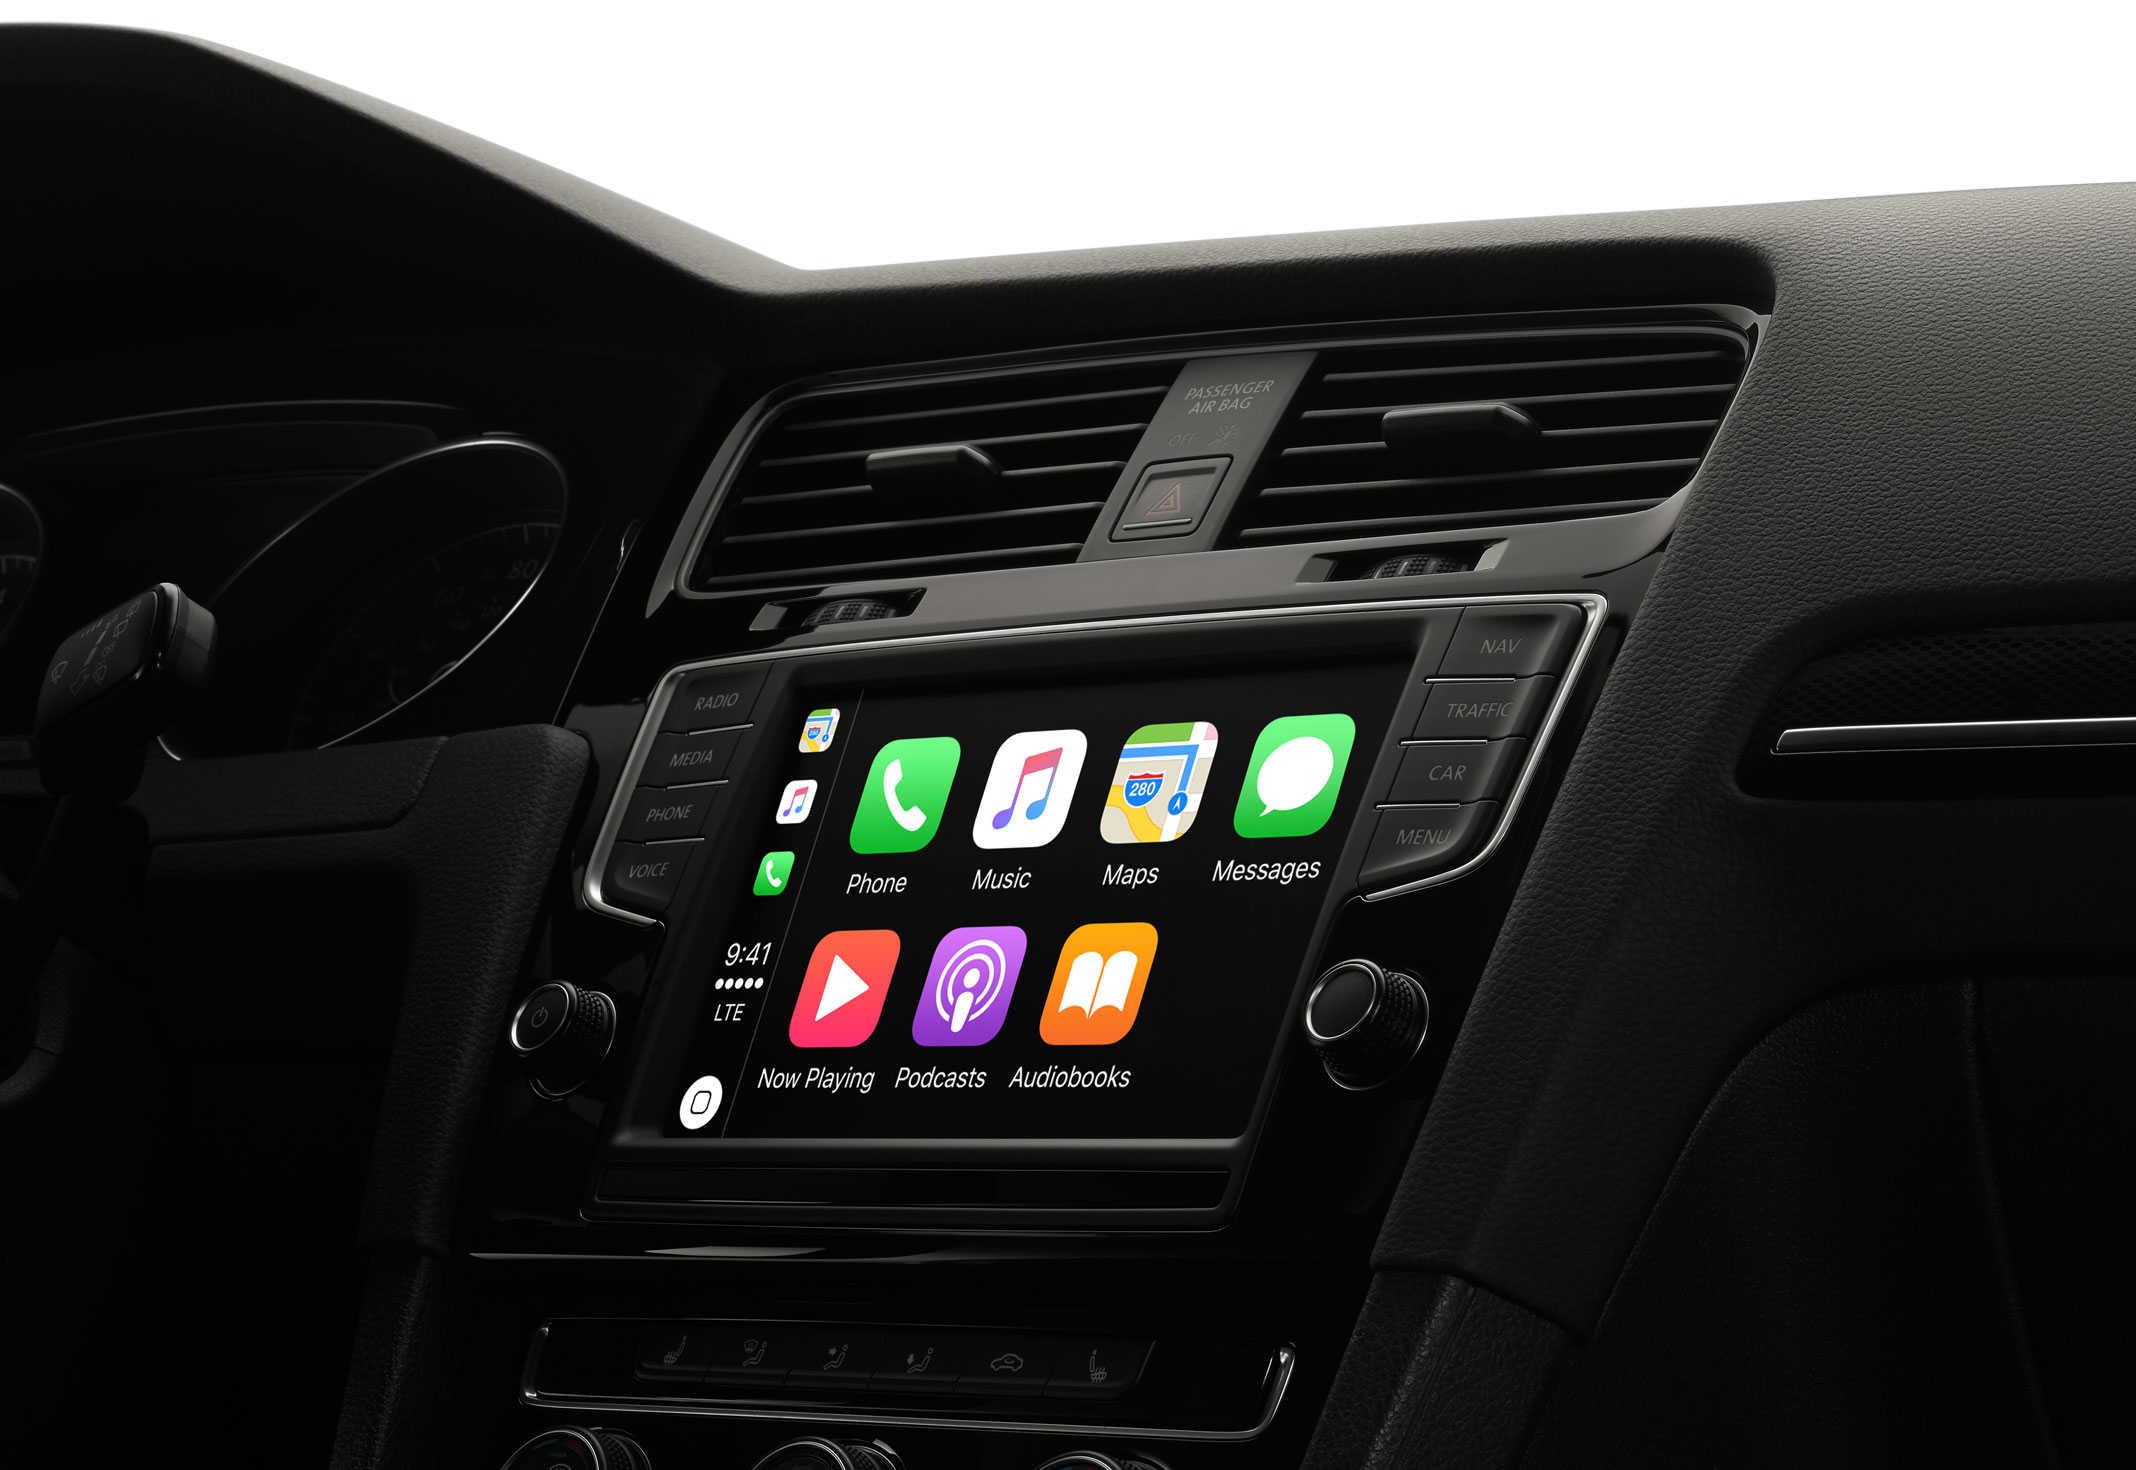 apple carplay nedir hangi otomobil modelleri destekliyor. Black Bedroom Furniture Sets. Home Design Ideas